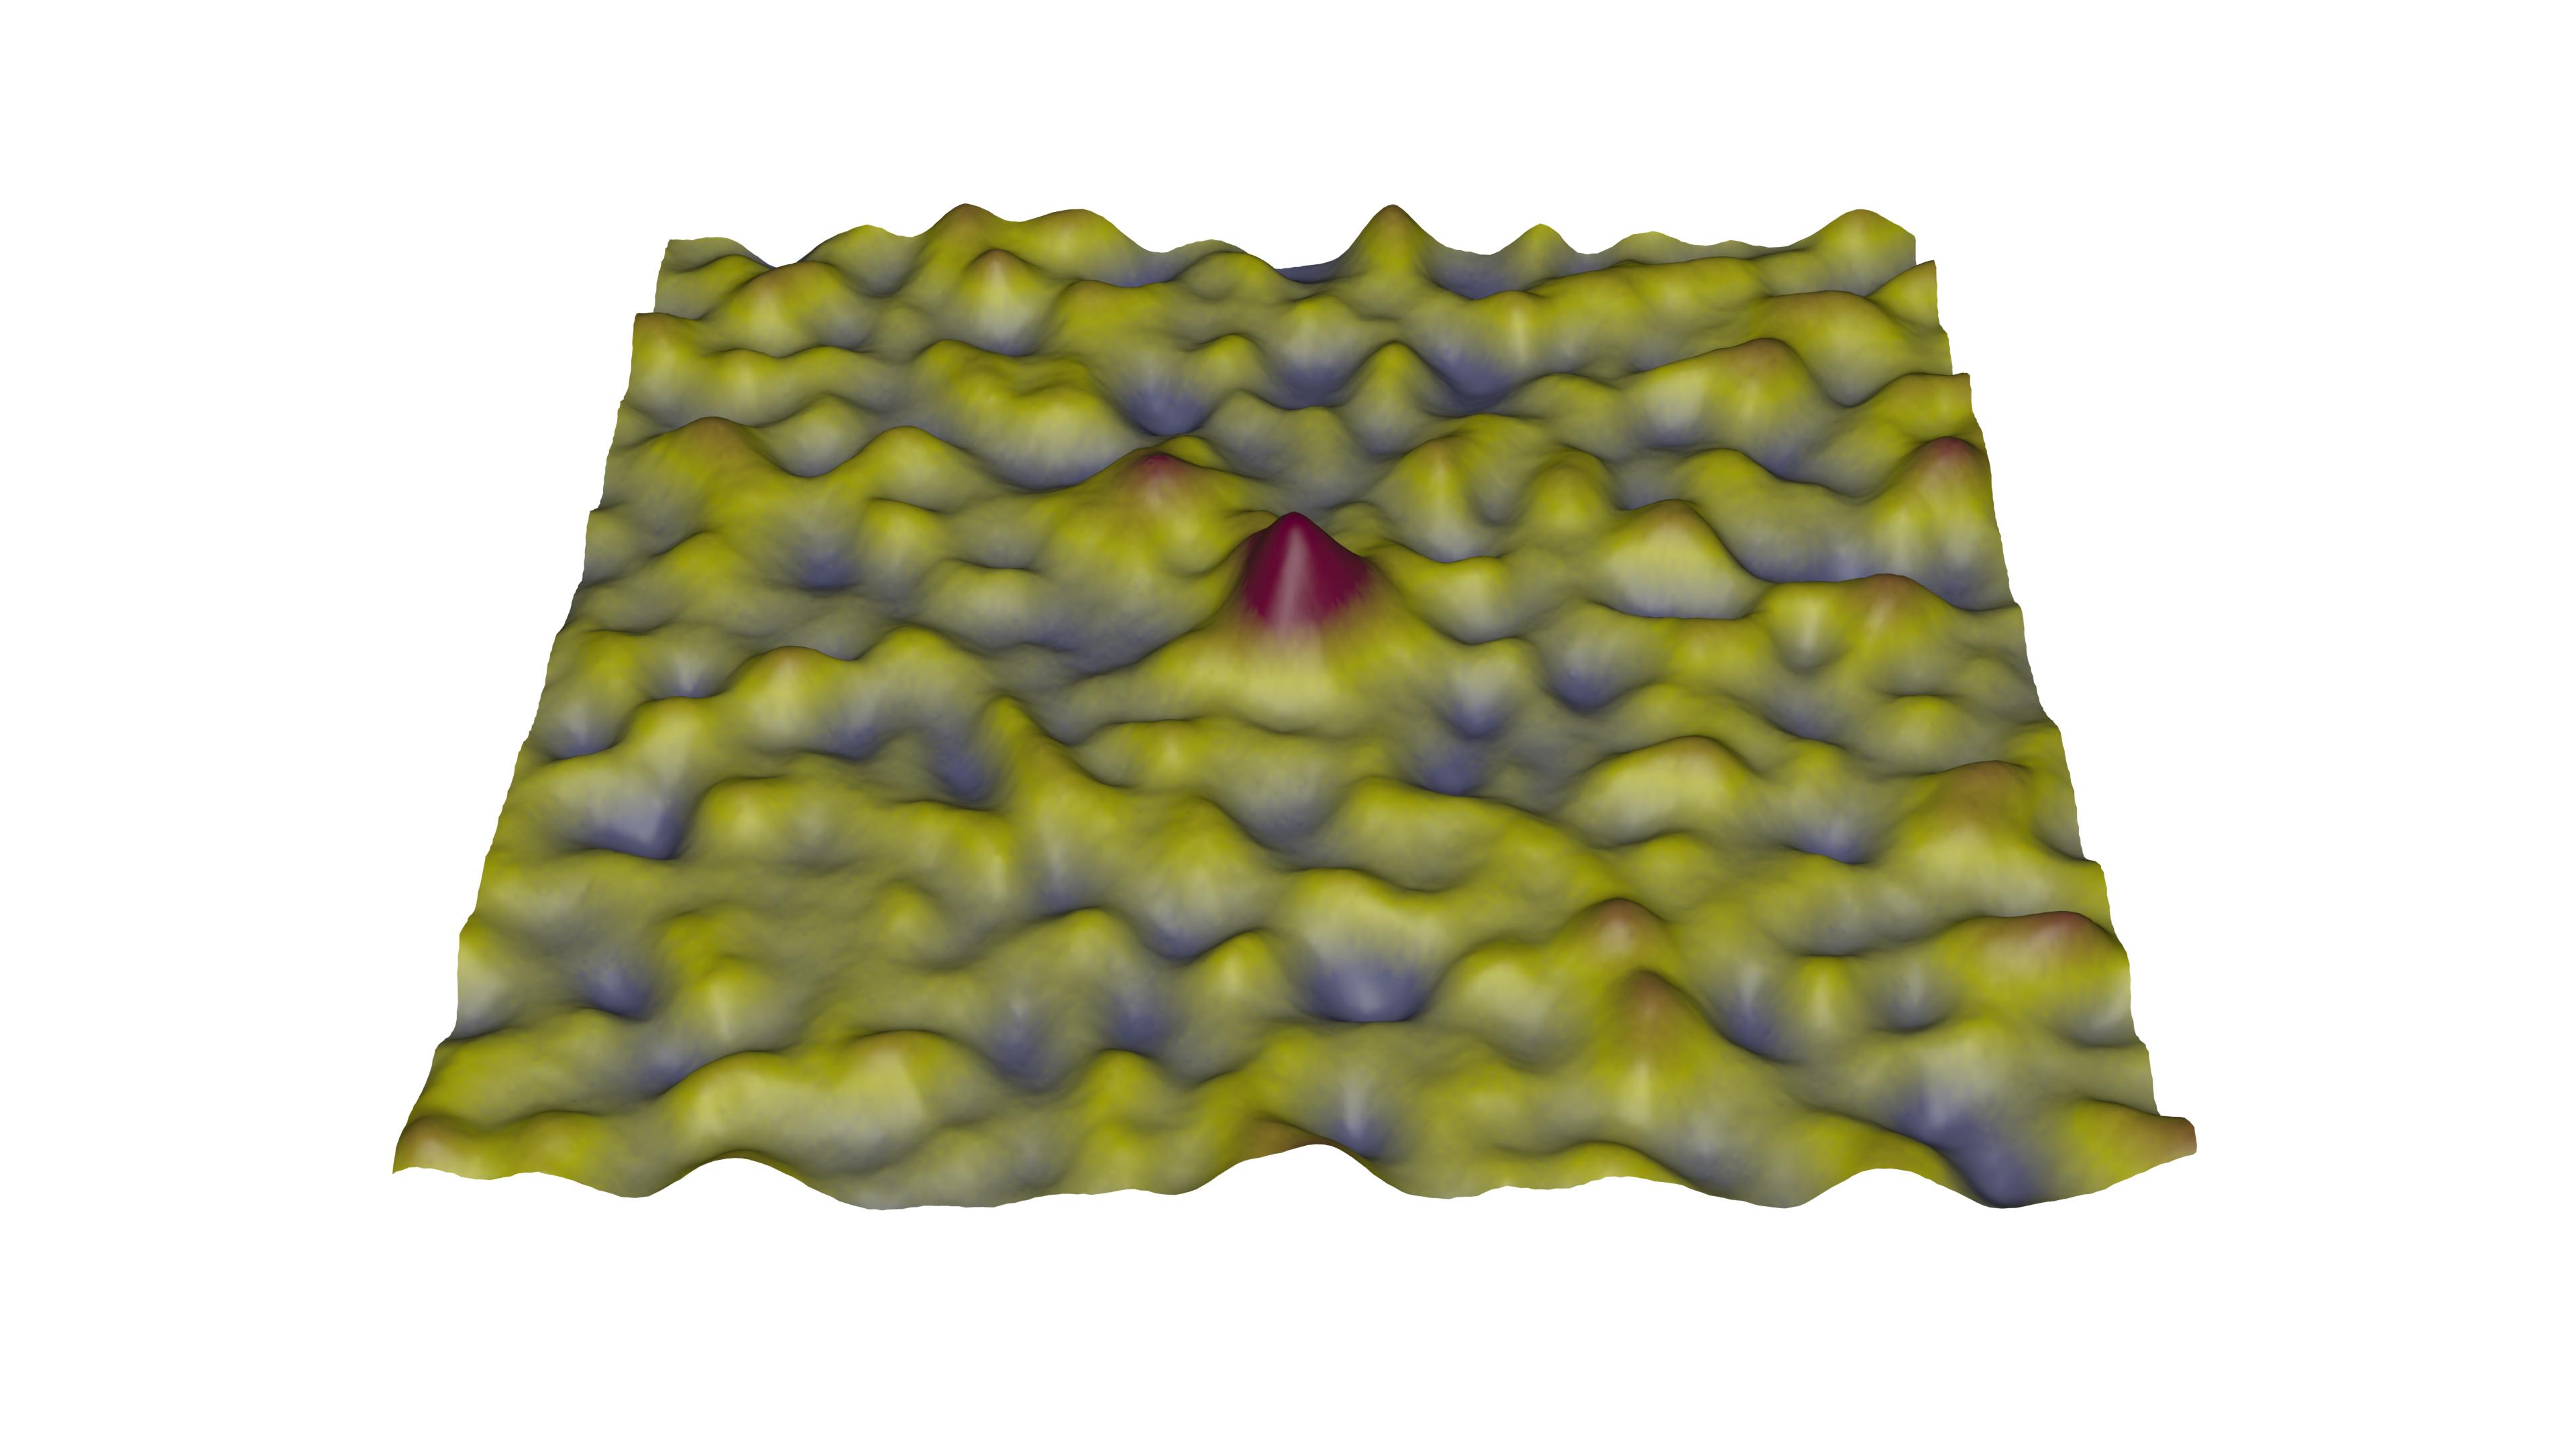 1567214290476-ESA_Planck_CMB_lensing_quasars.jpg